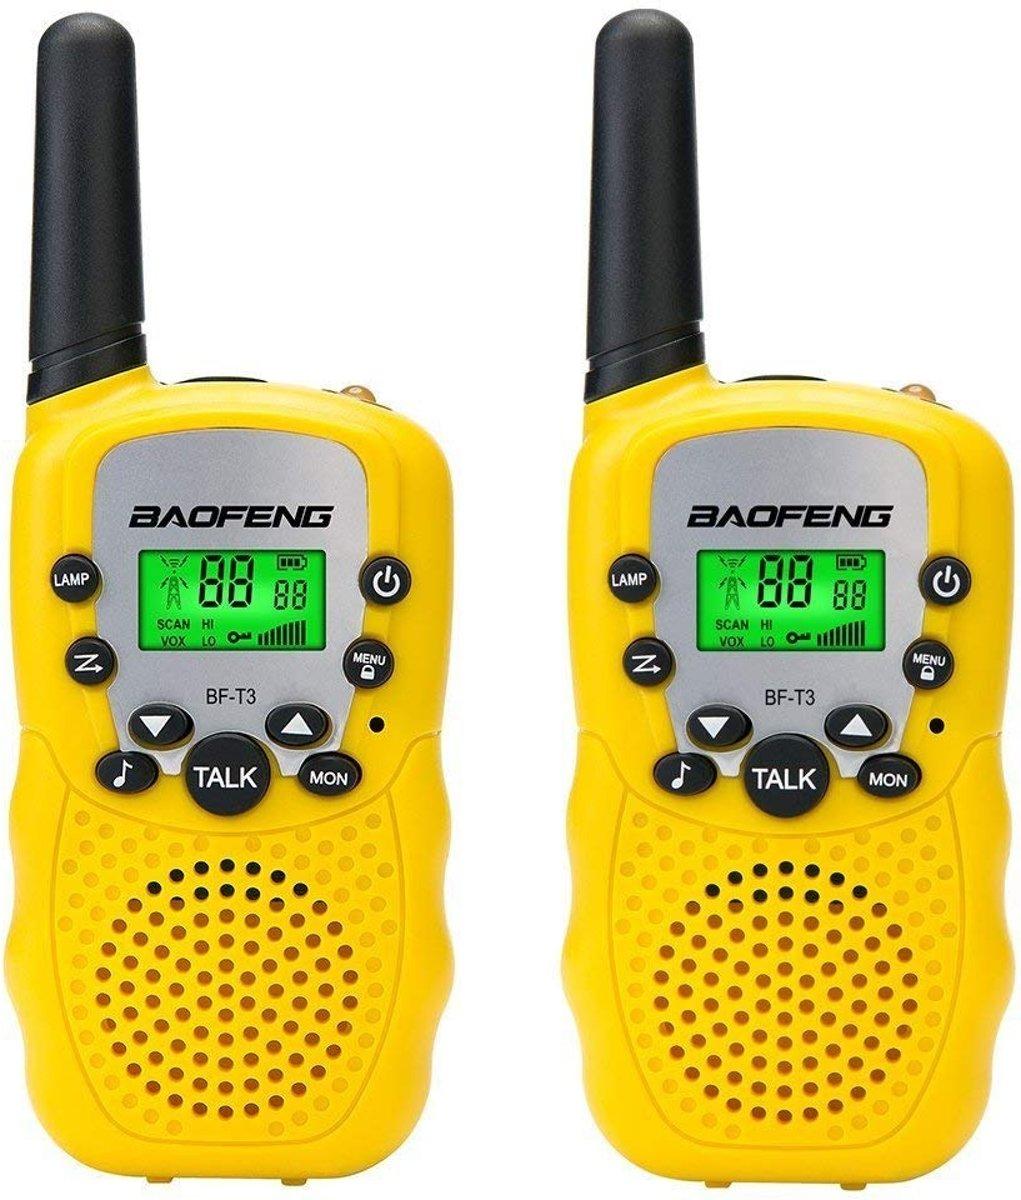 Set van 2 gele kinder walkie talkies (incl. 8 batterijen)